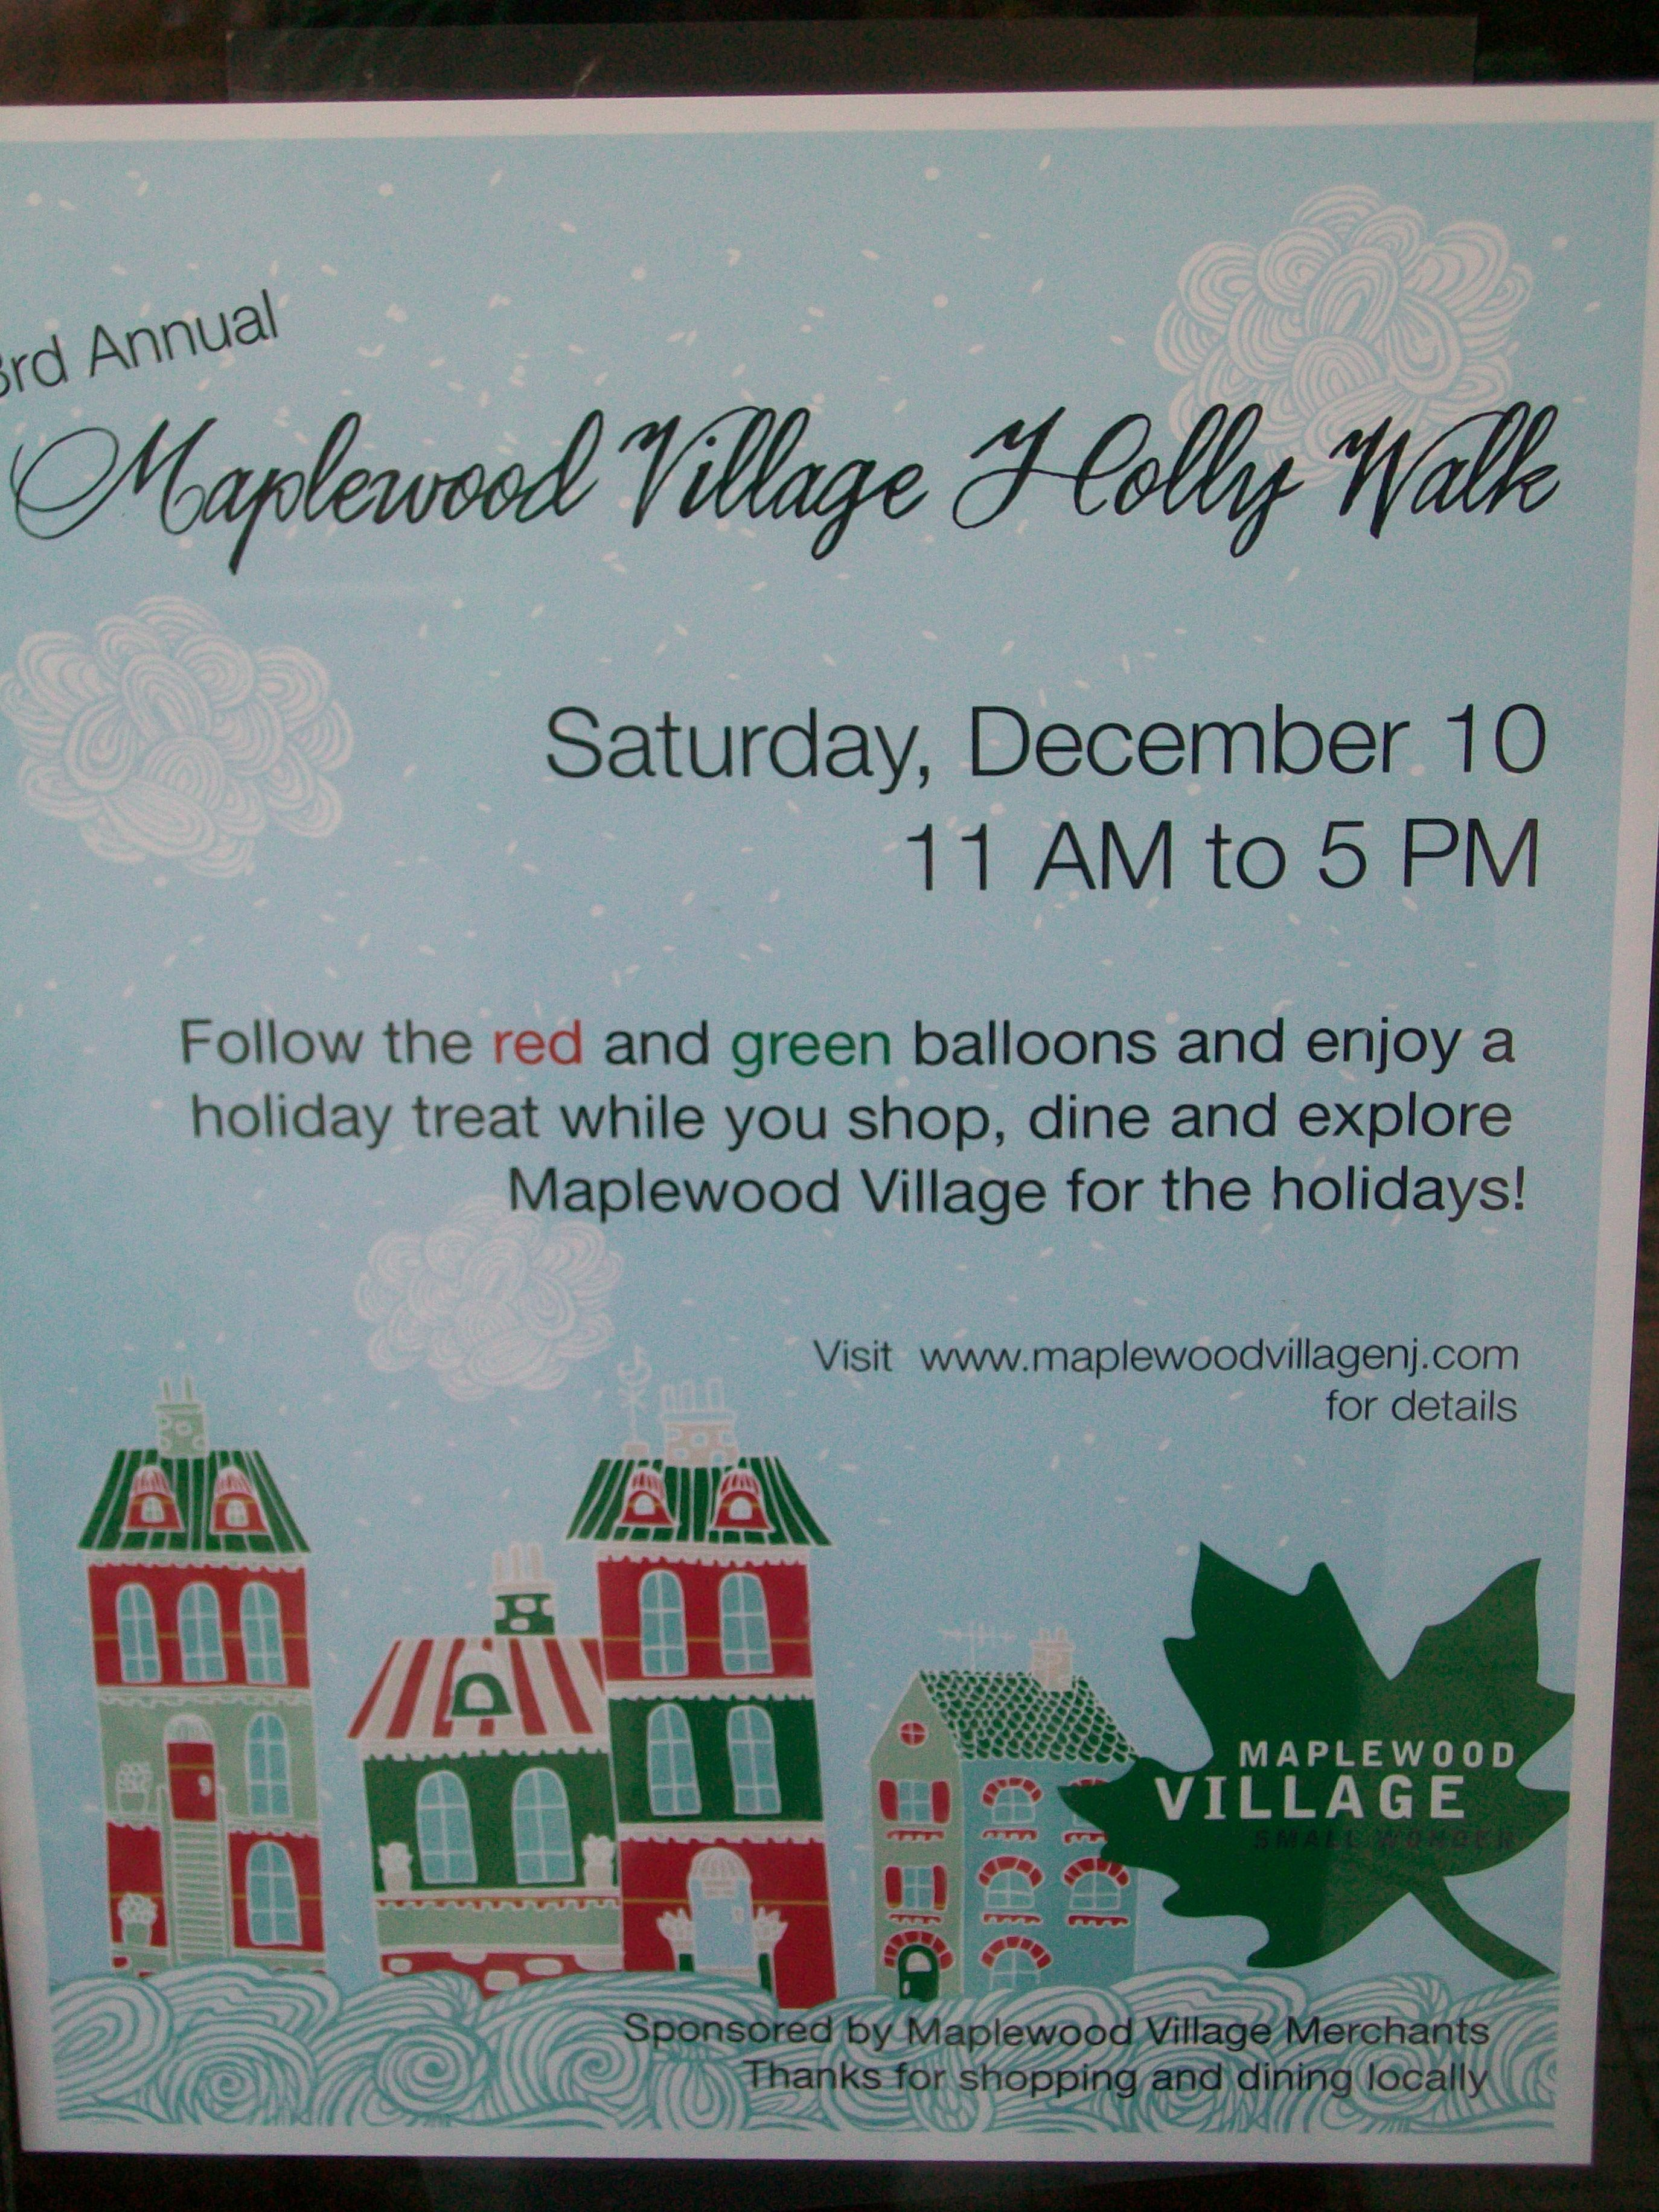 355dfa71c0de9ebea0d6_flyer_for_the_maplewood_village_holly_walk.jpg